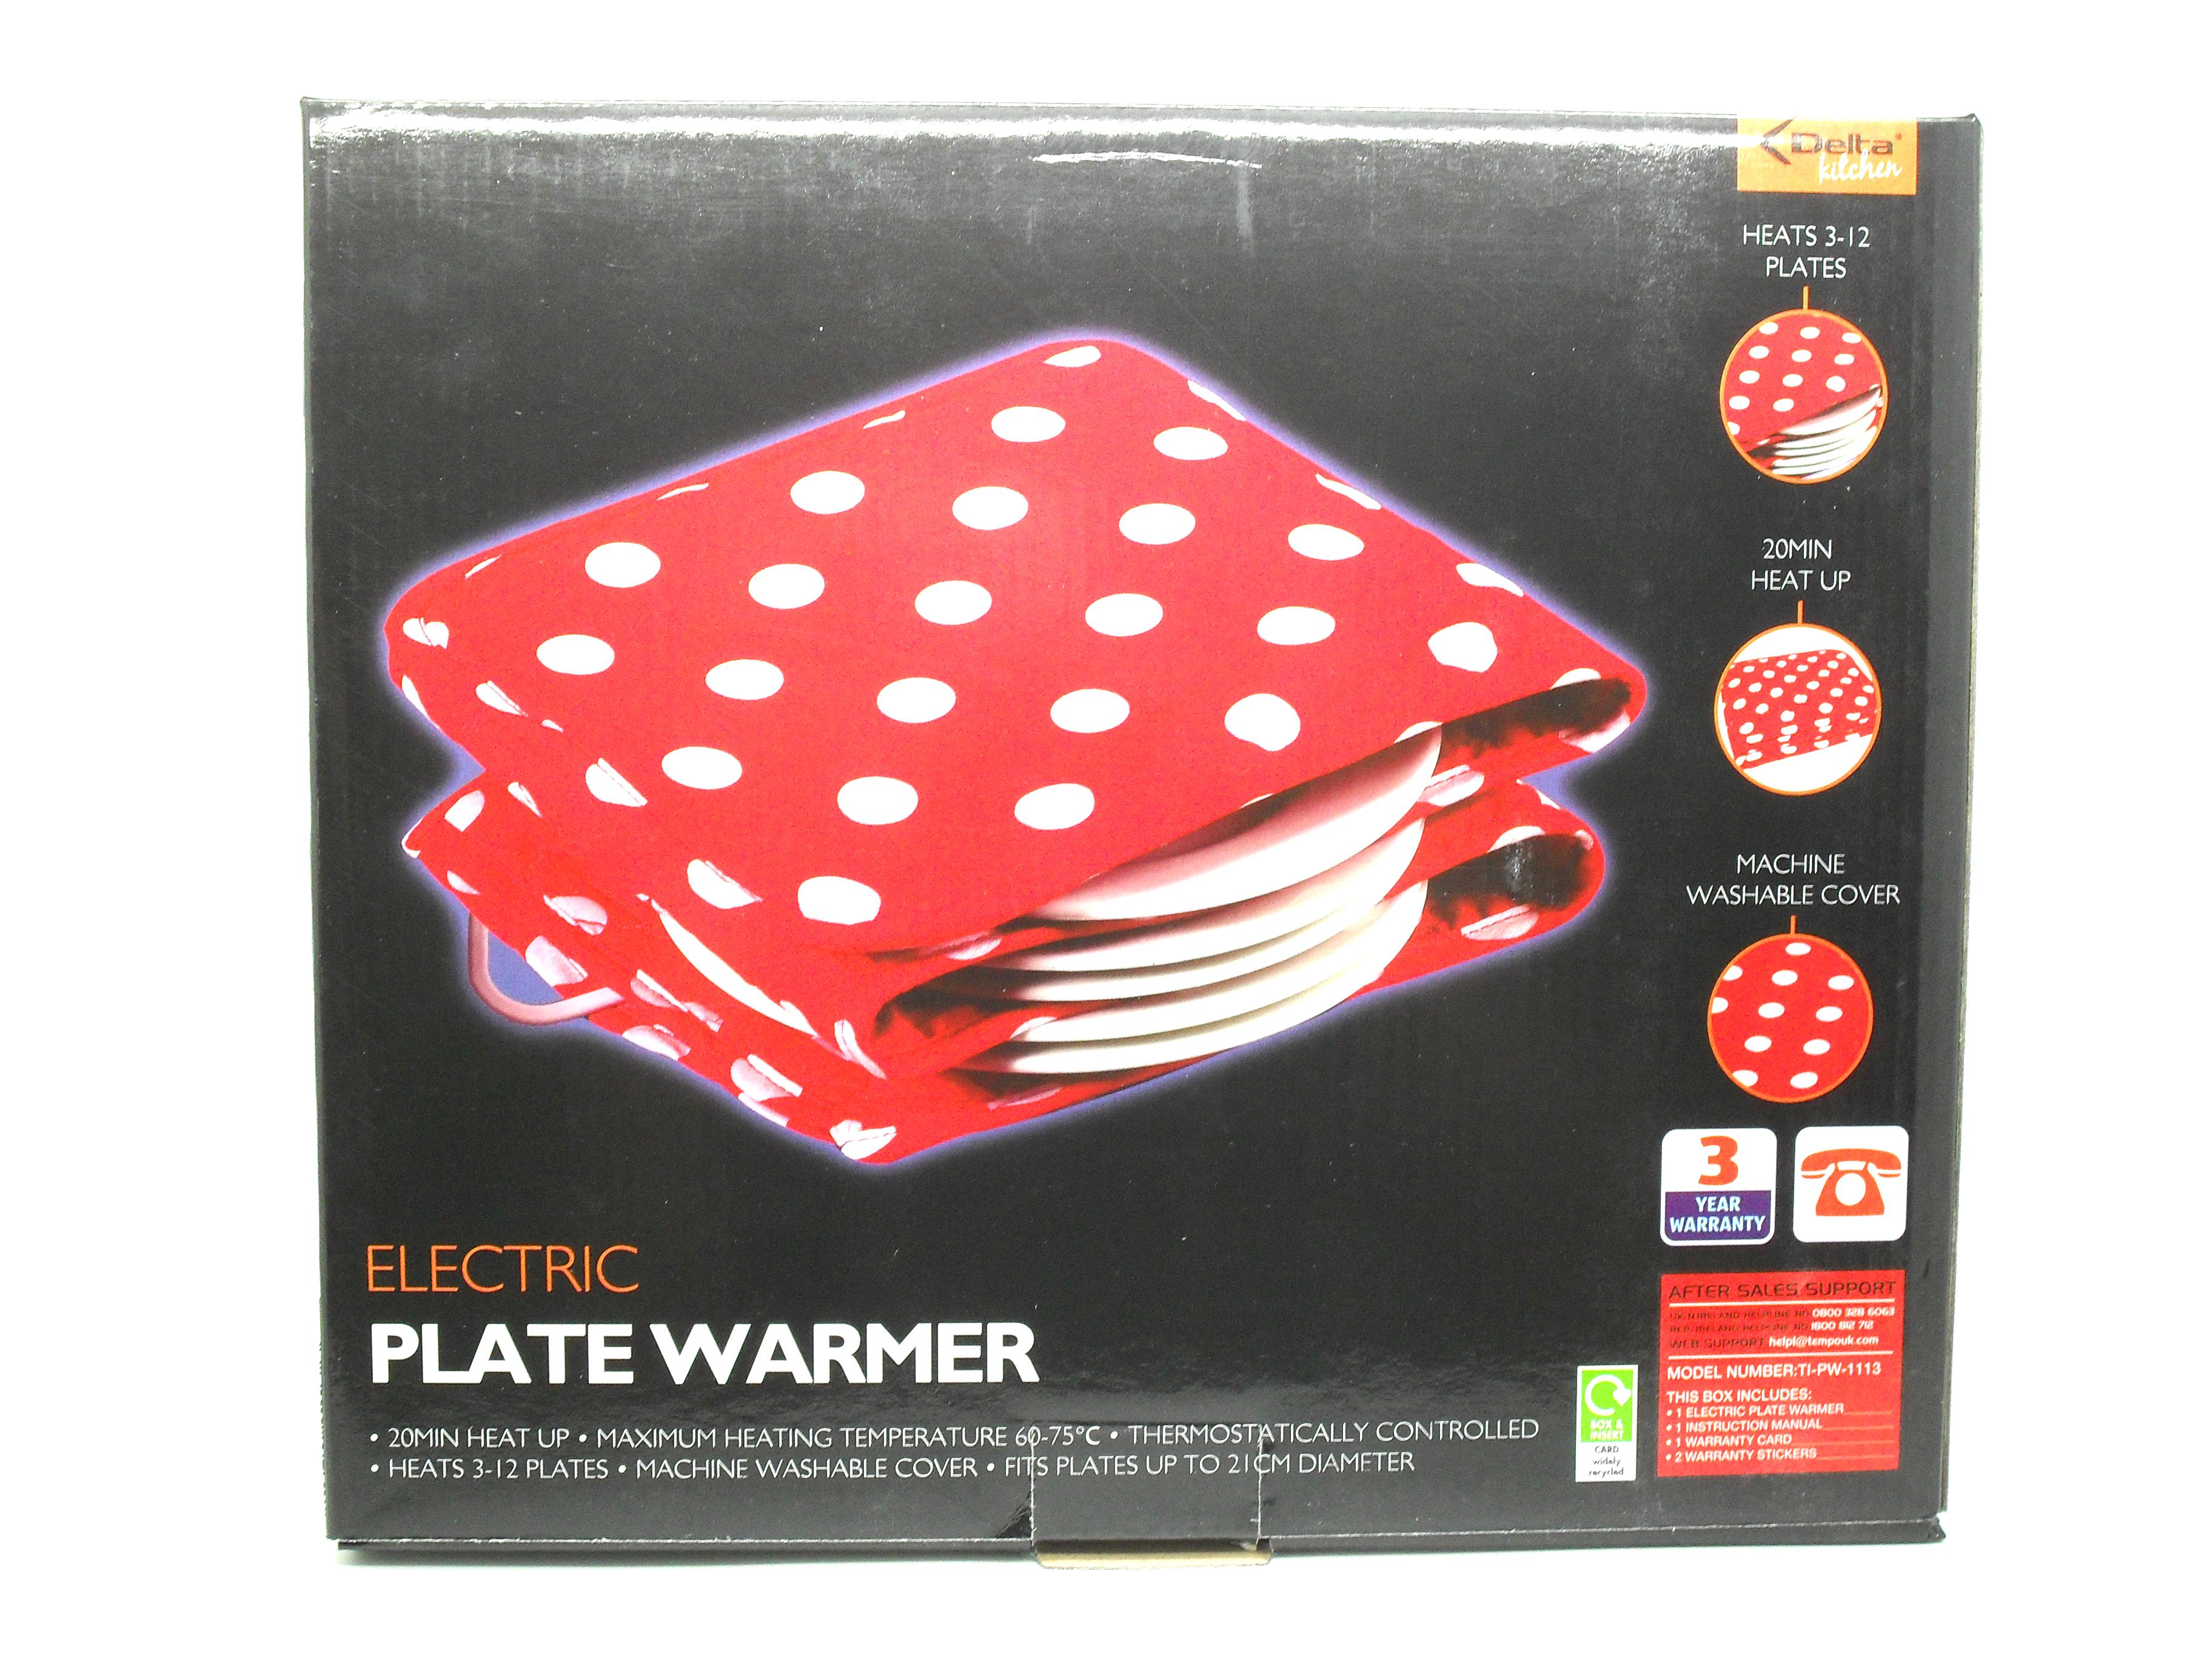 delta kitchen electric plate warmer blanket heats 3 to 12. Black Bedroom Furniture Sets. Home Design Ideas